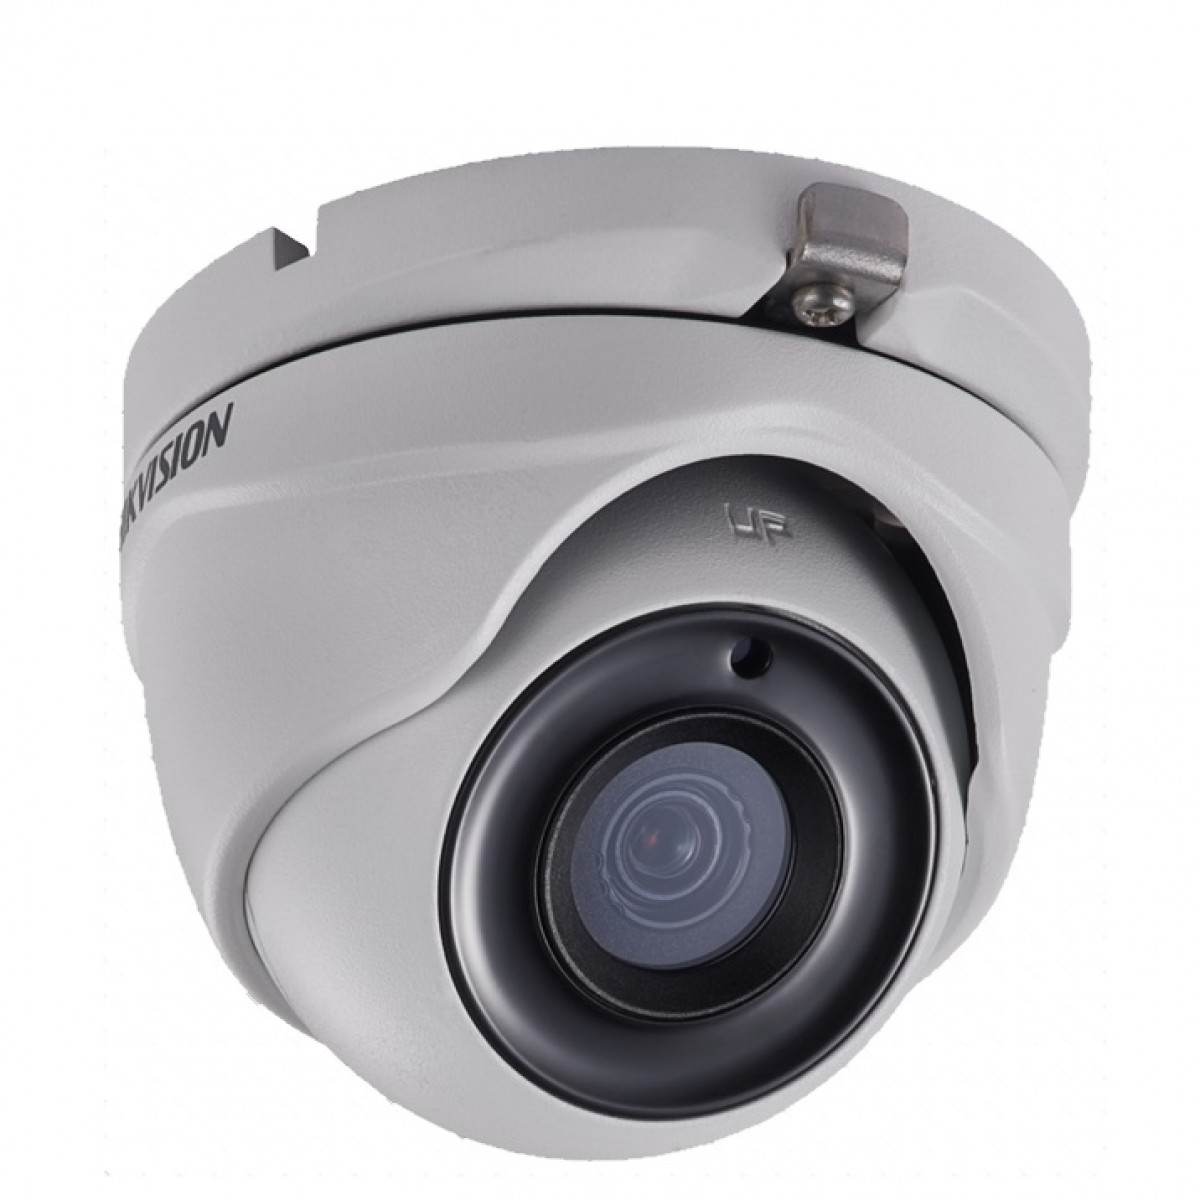 Hikvision dome DS-2CE56H1T-ITM F2.8